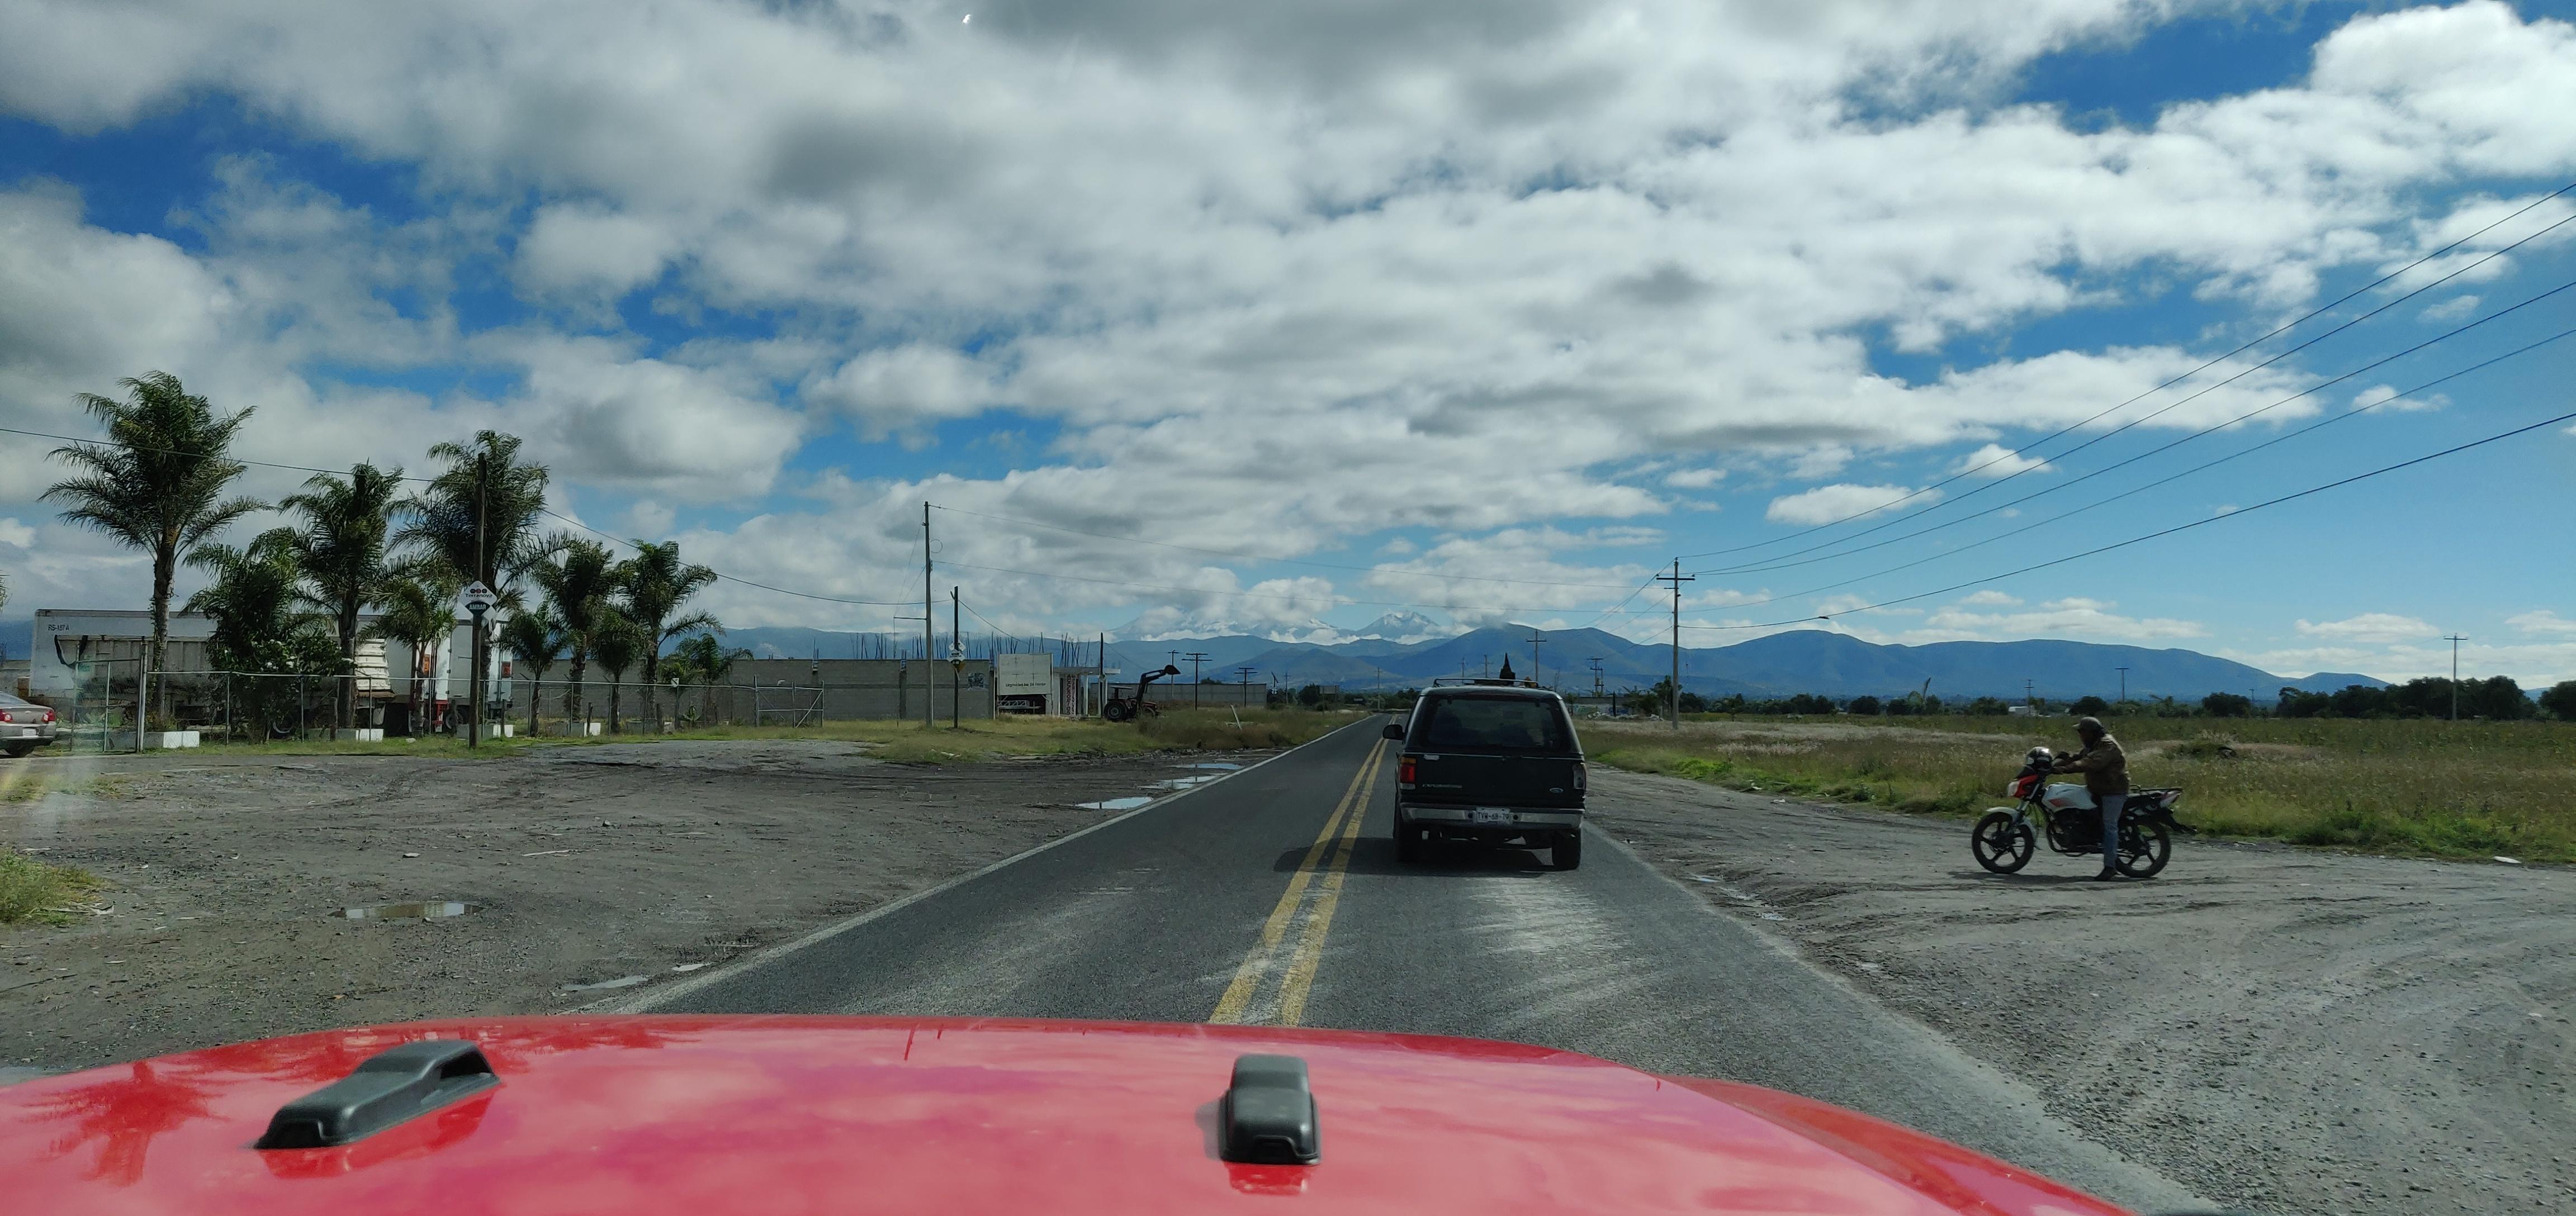 De camino a TLACHICHUCA